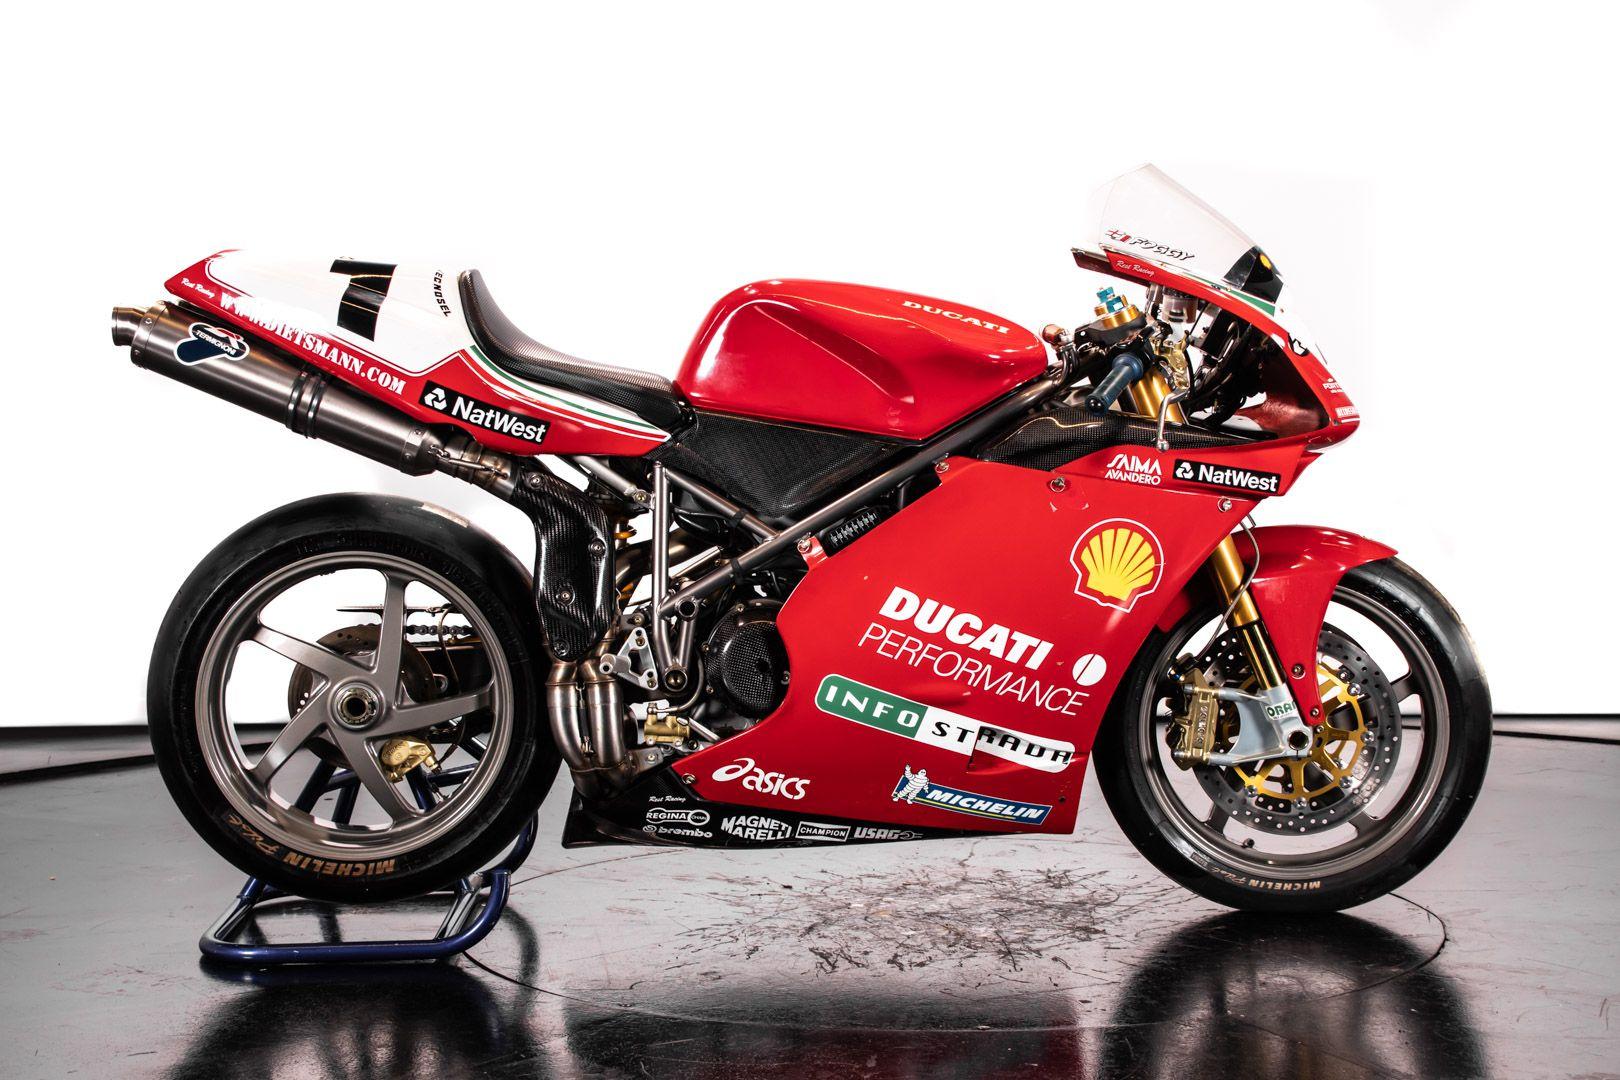 2008 Ducati 996 Fogarty Evocation 03/12 84206